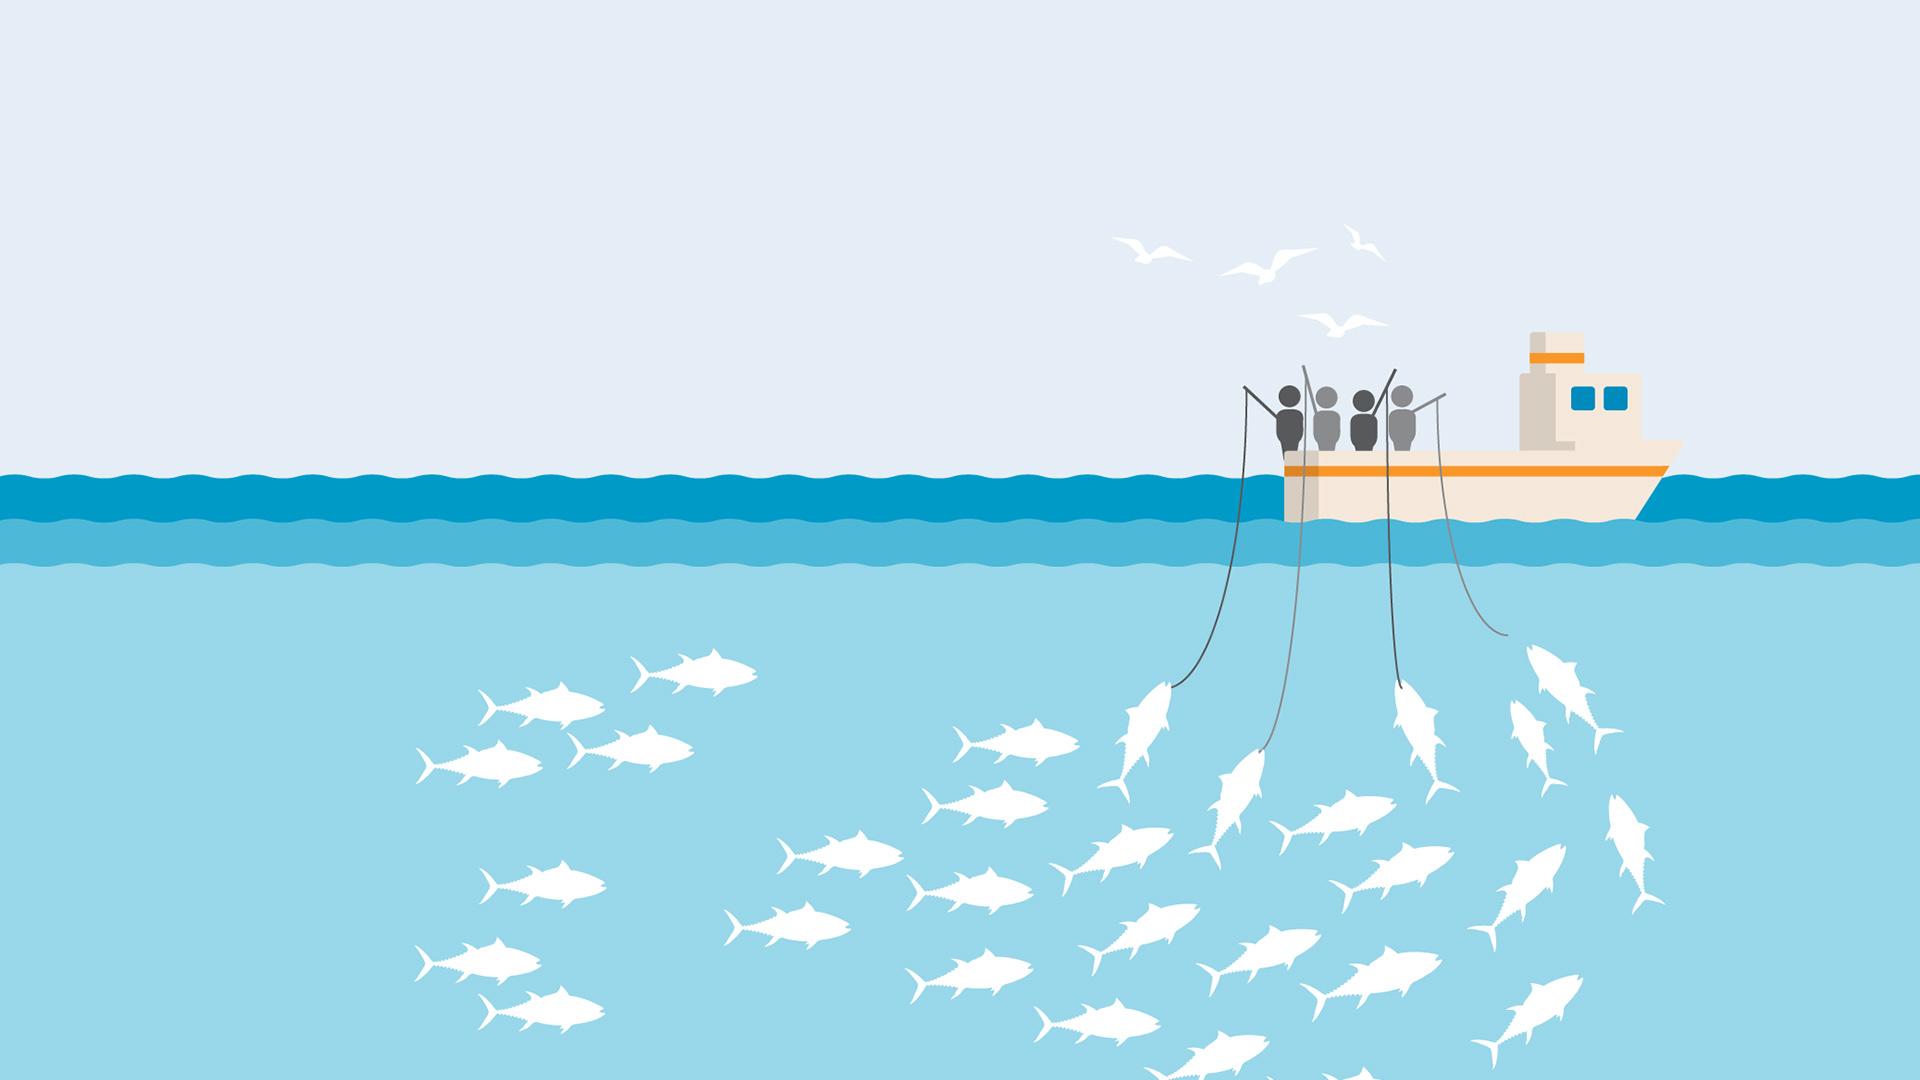 Pole And Line Fishing Gear Marine Stewardship Council Marine Stewardship Council